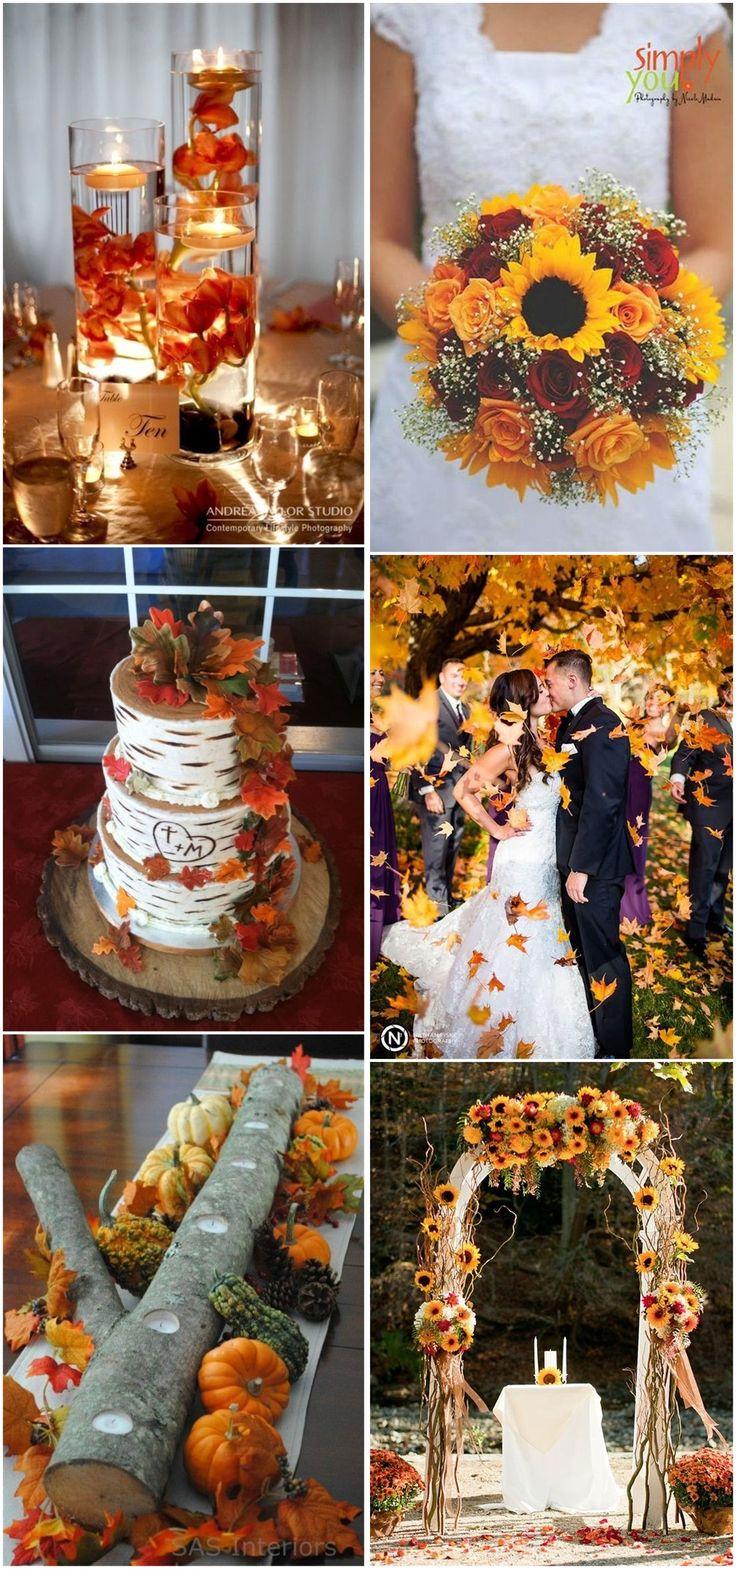 Traditional wedding decor ideas 2018   best Darrians wedding images on Pinterest  Nautical wedding